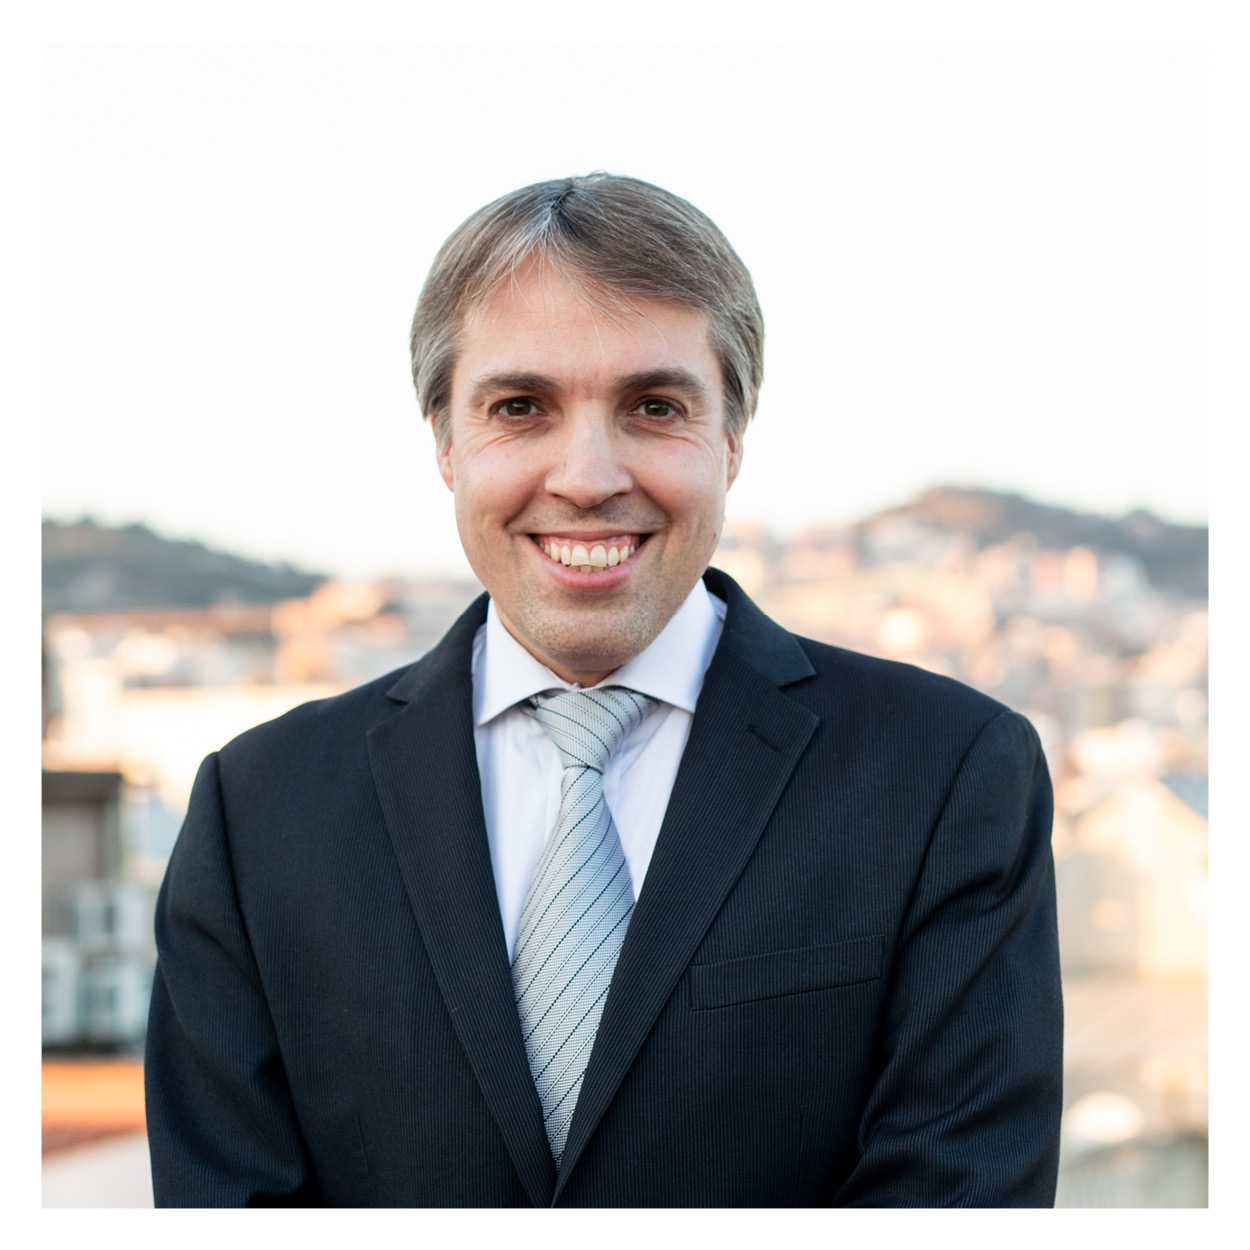 Equipo Marbà, Amadeu Pujol | Marbà